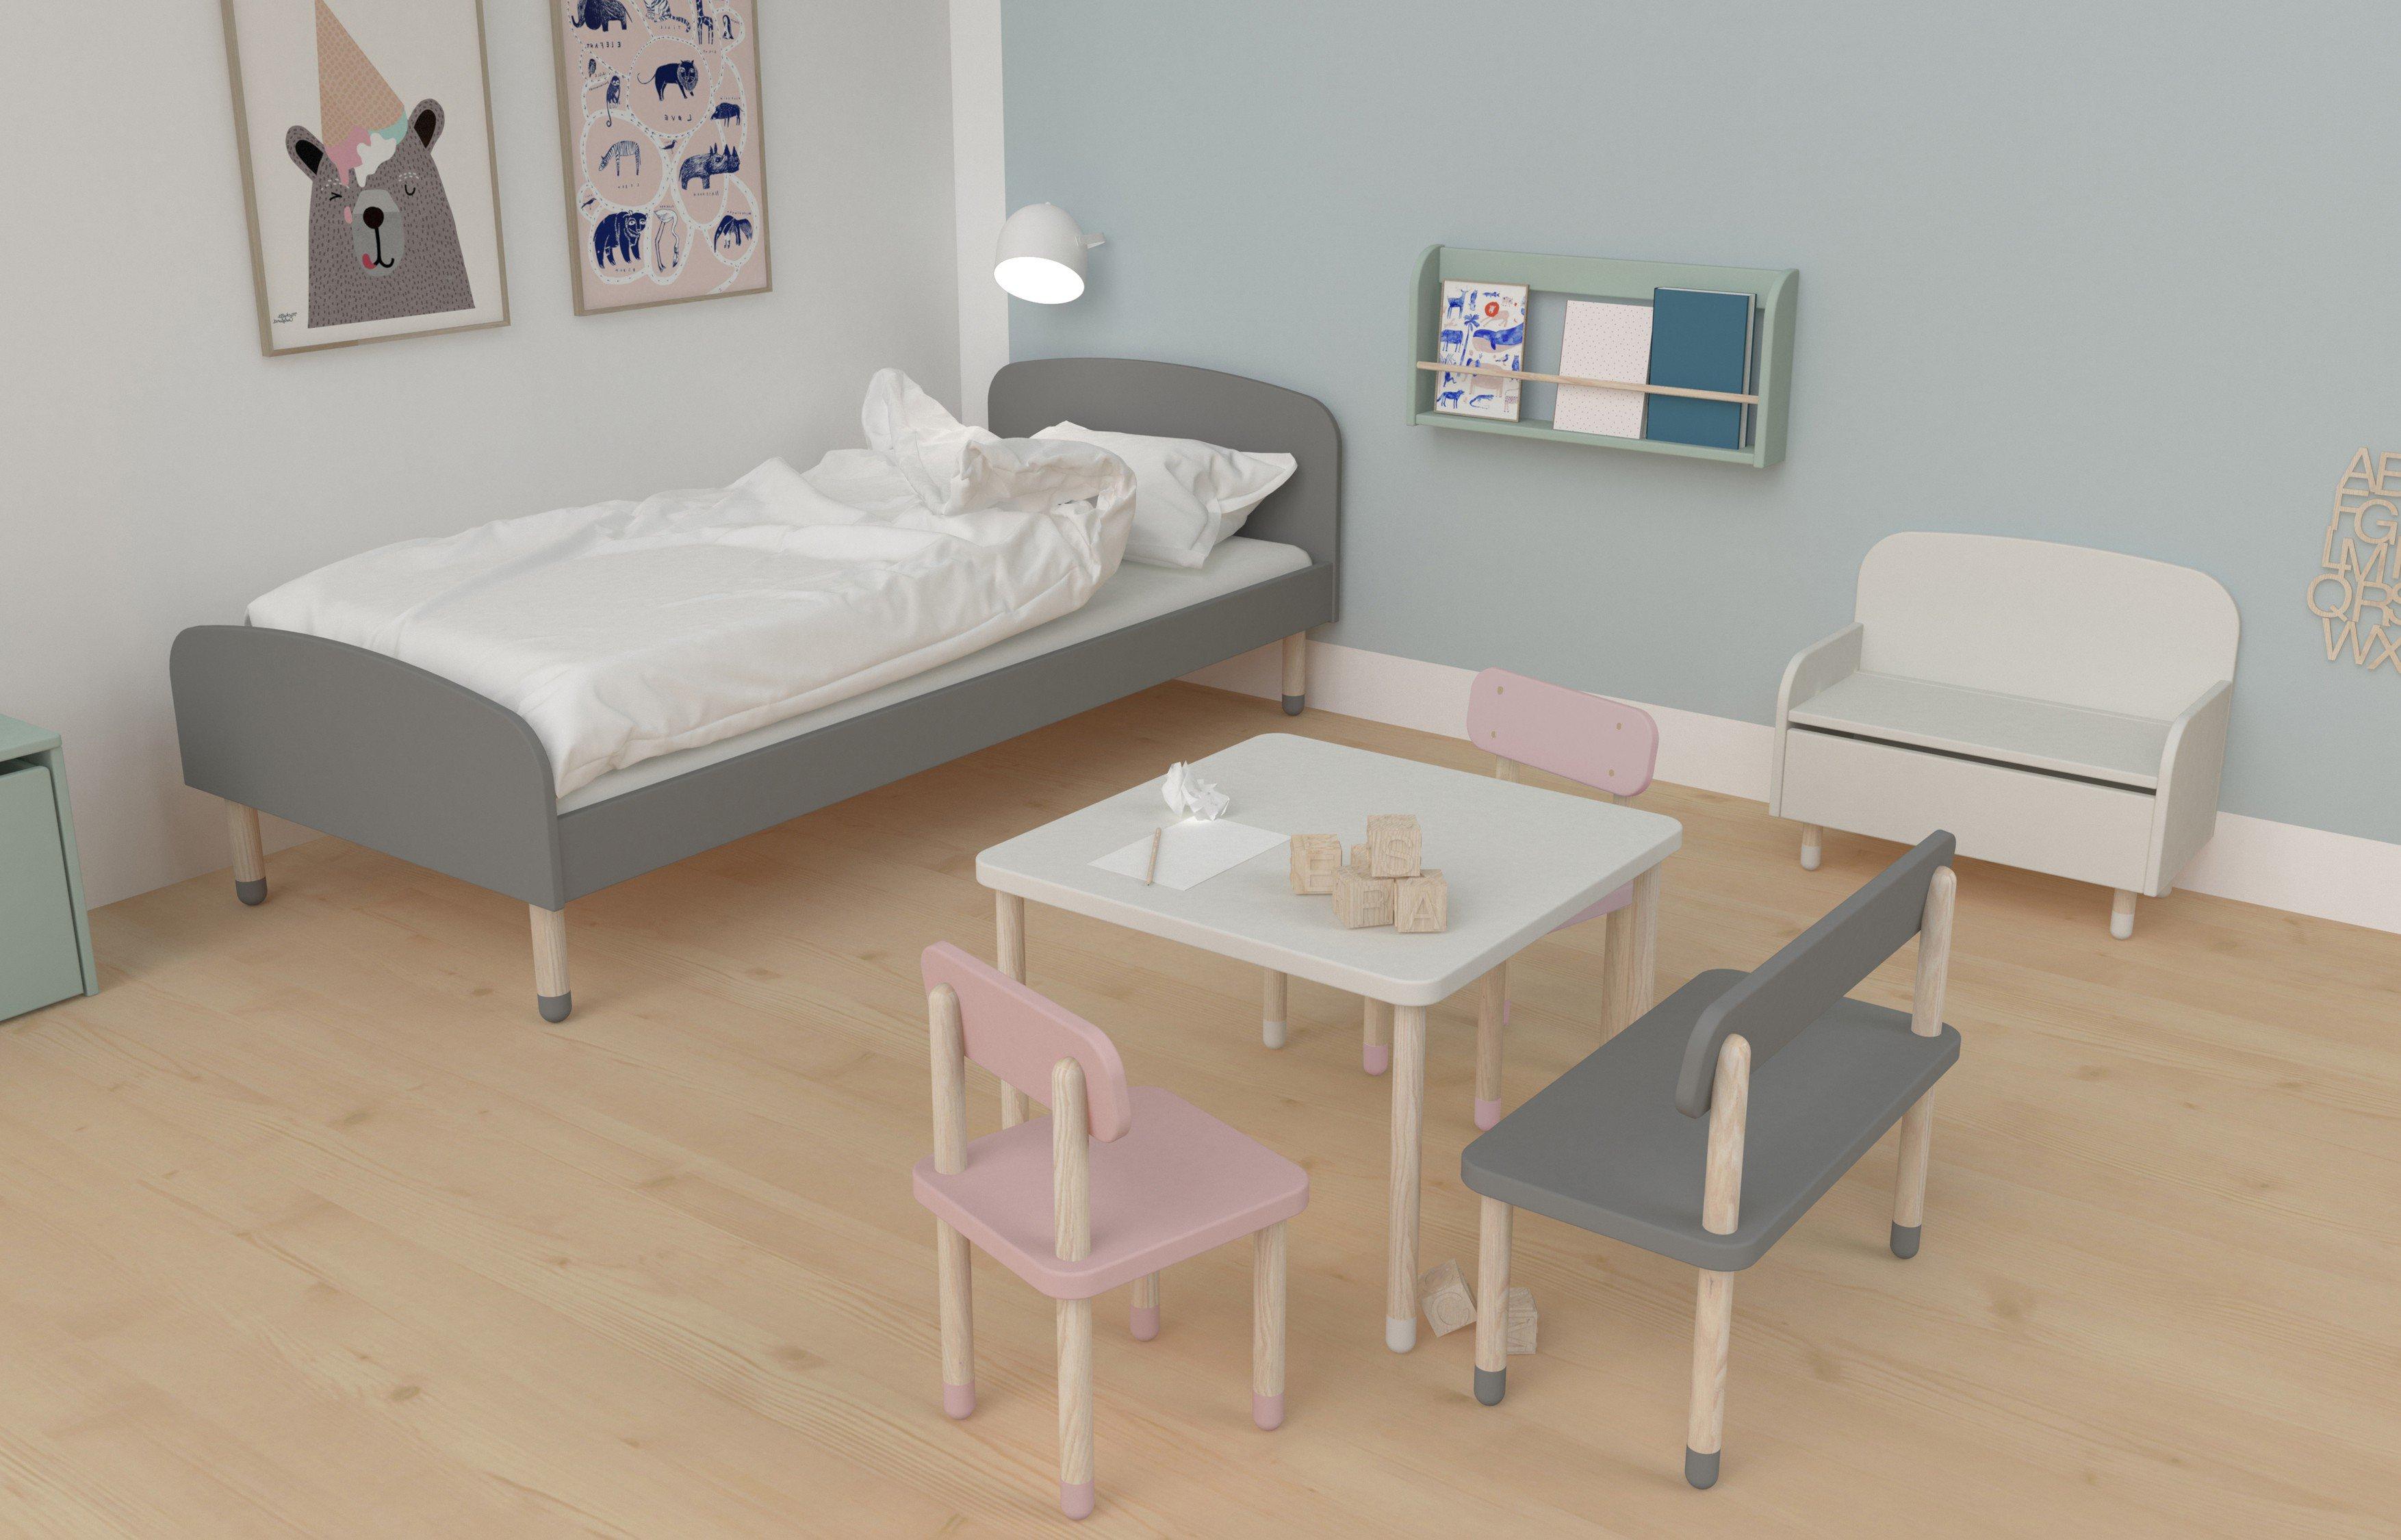 kinder tisch stuhl best bild sparset levin kindertisch mit stuhl with kinder tisch stuhl. Black Bedroom Furniture Sets. Home Design Ideas